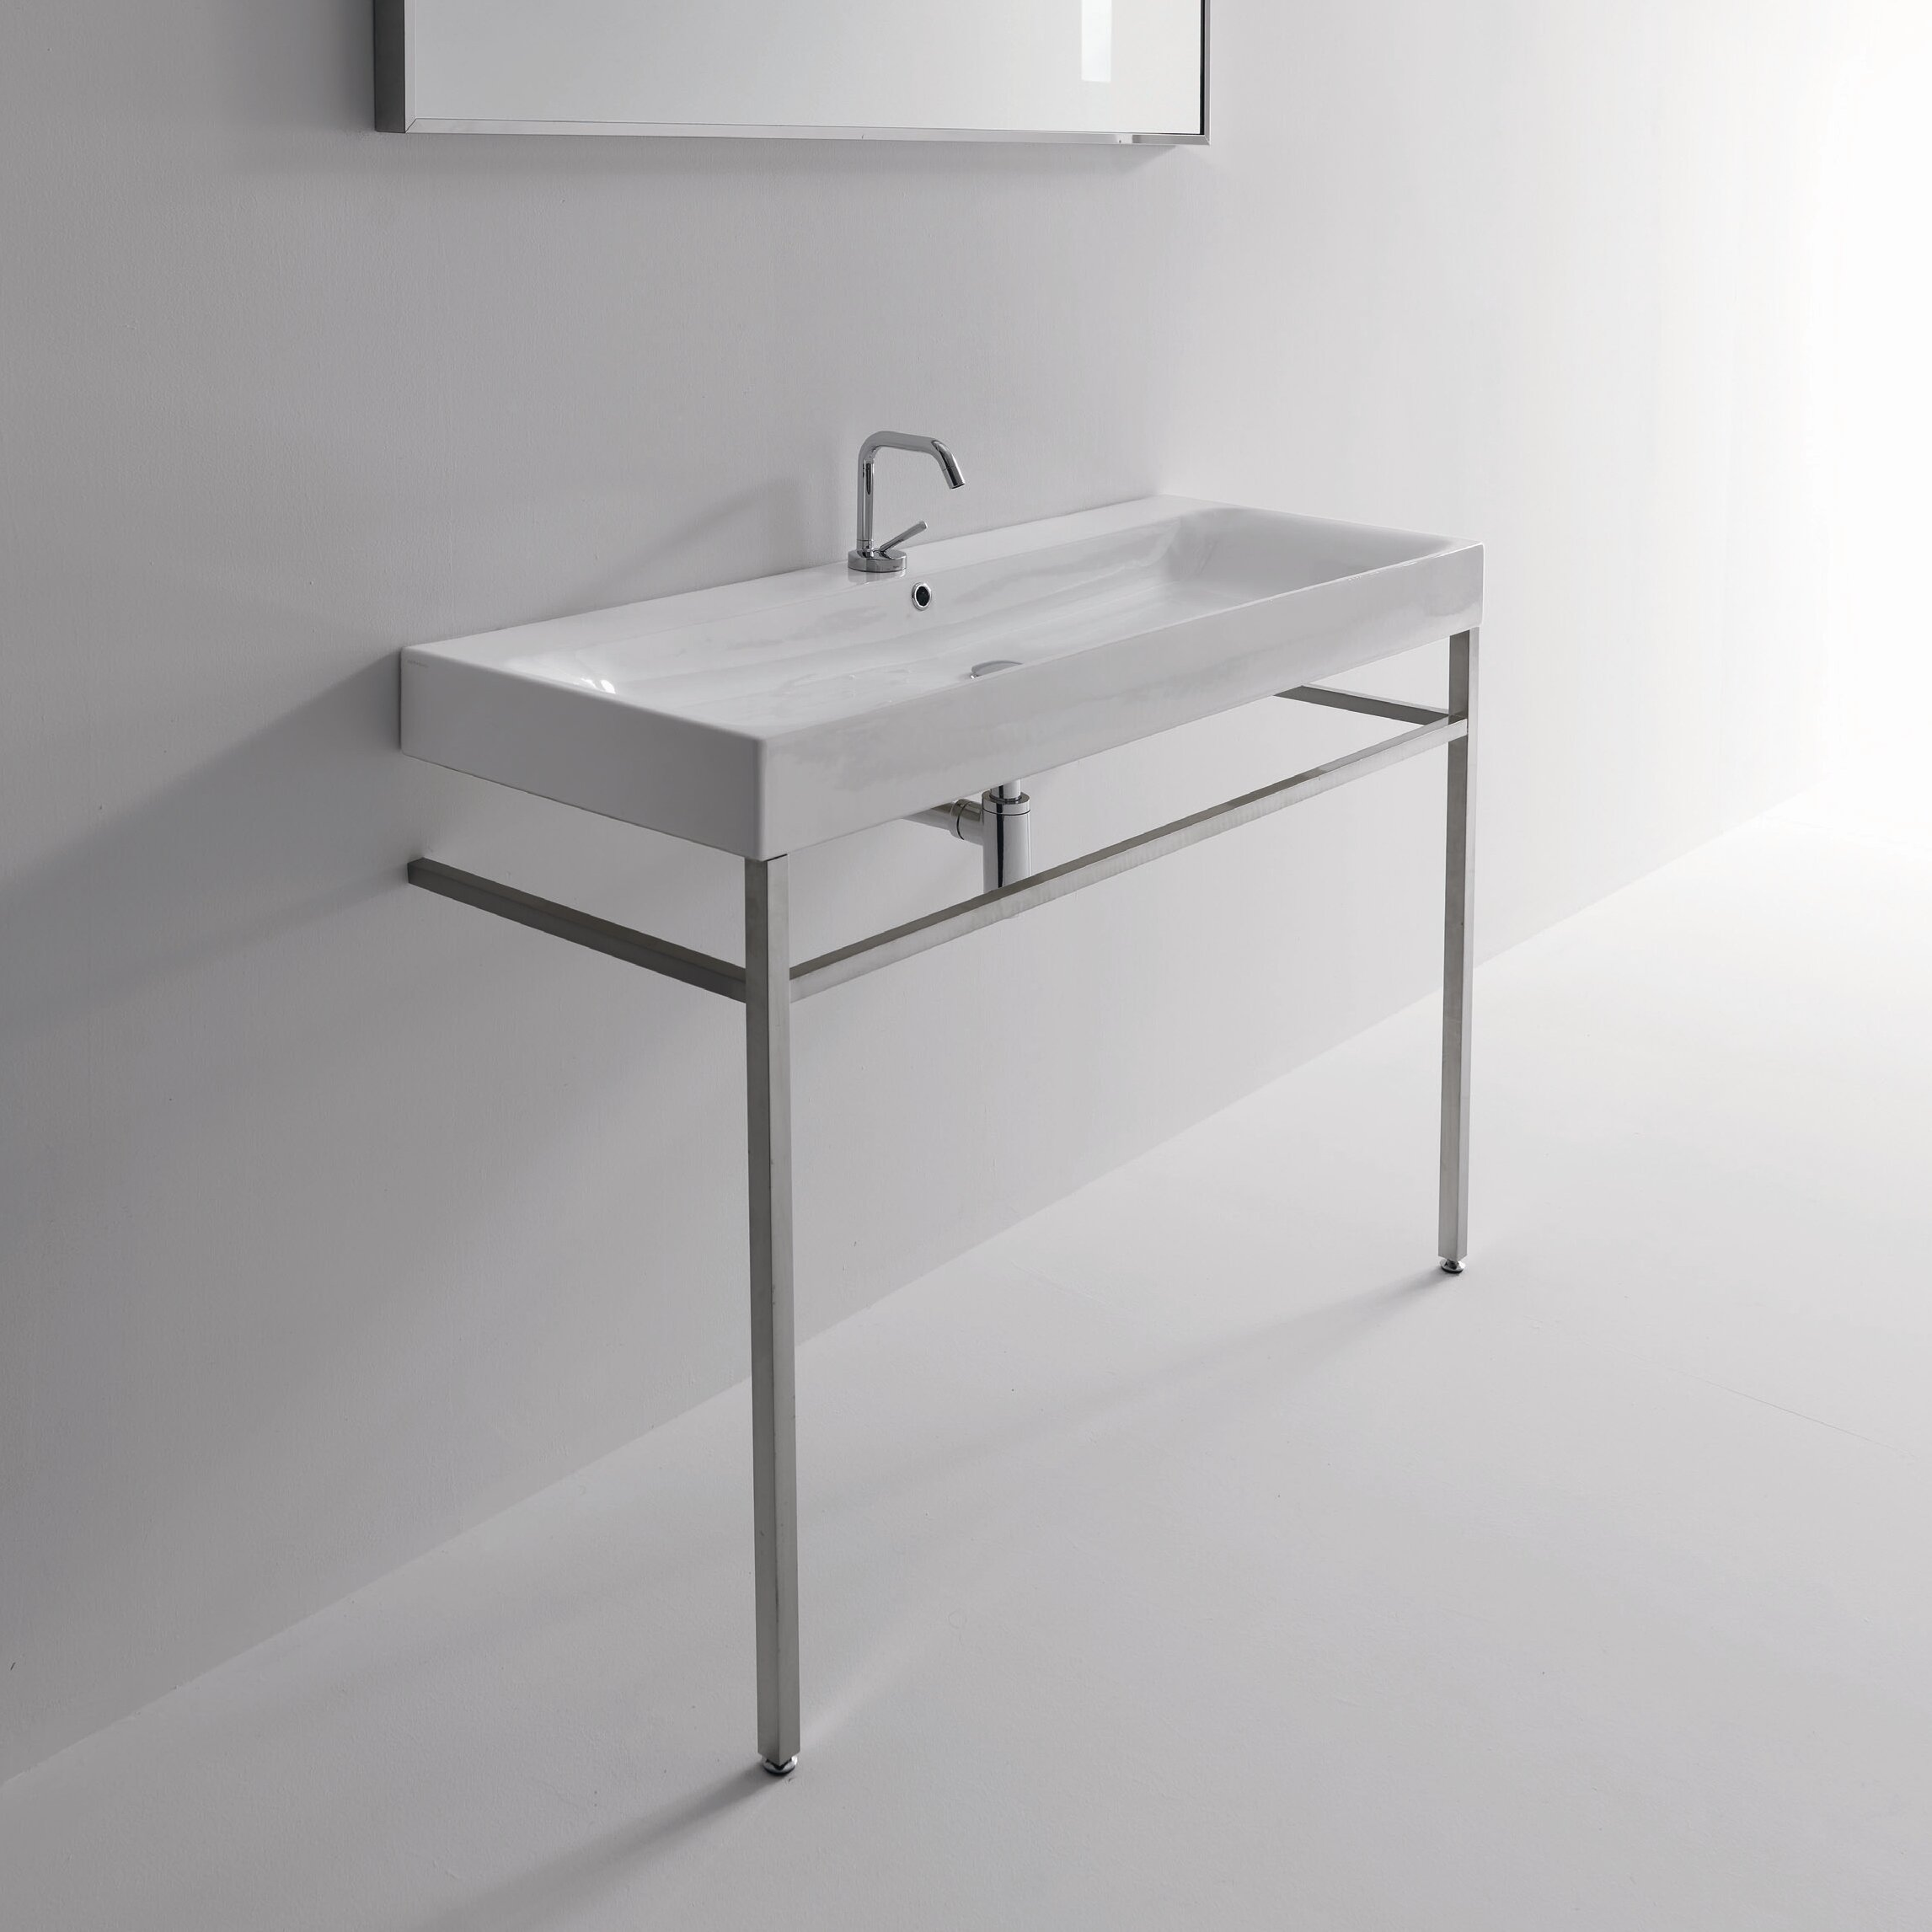 Kerasan Cento Free Standing Bathroom Sink